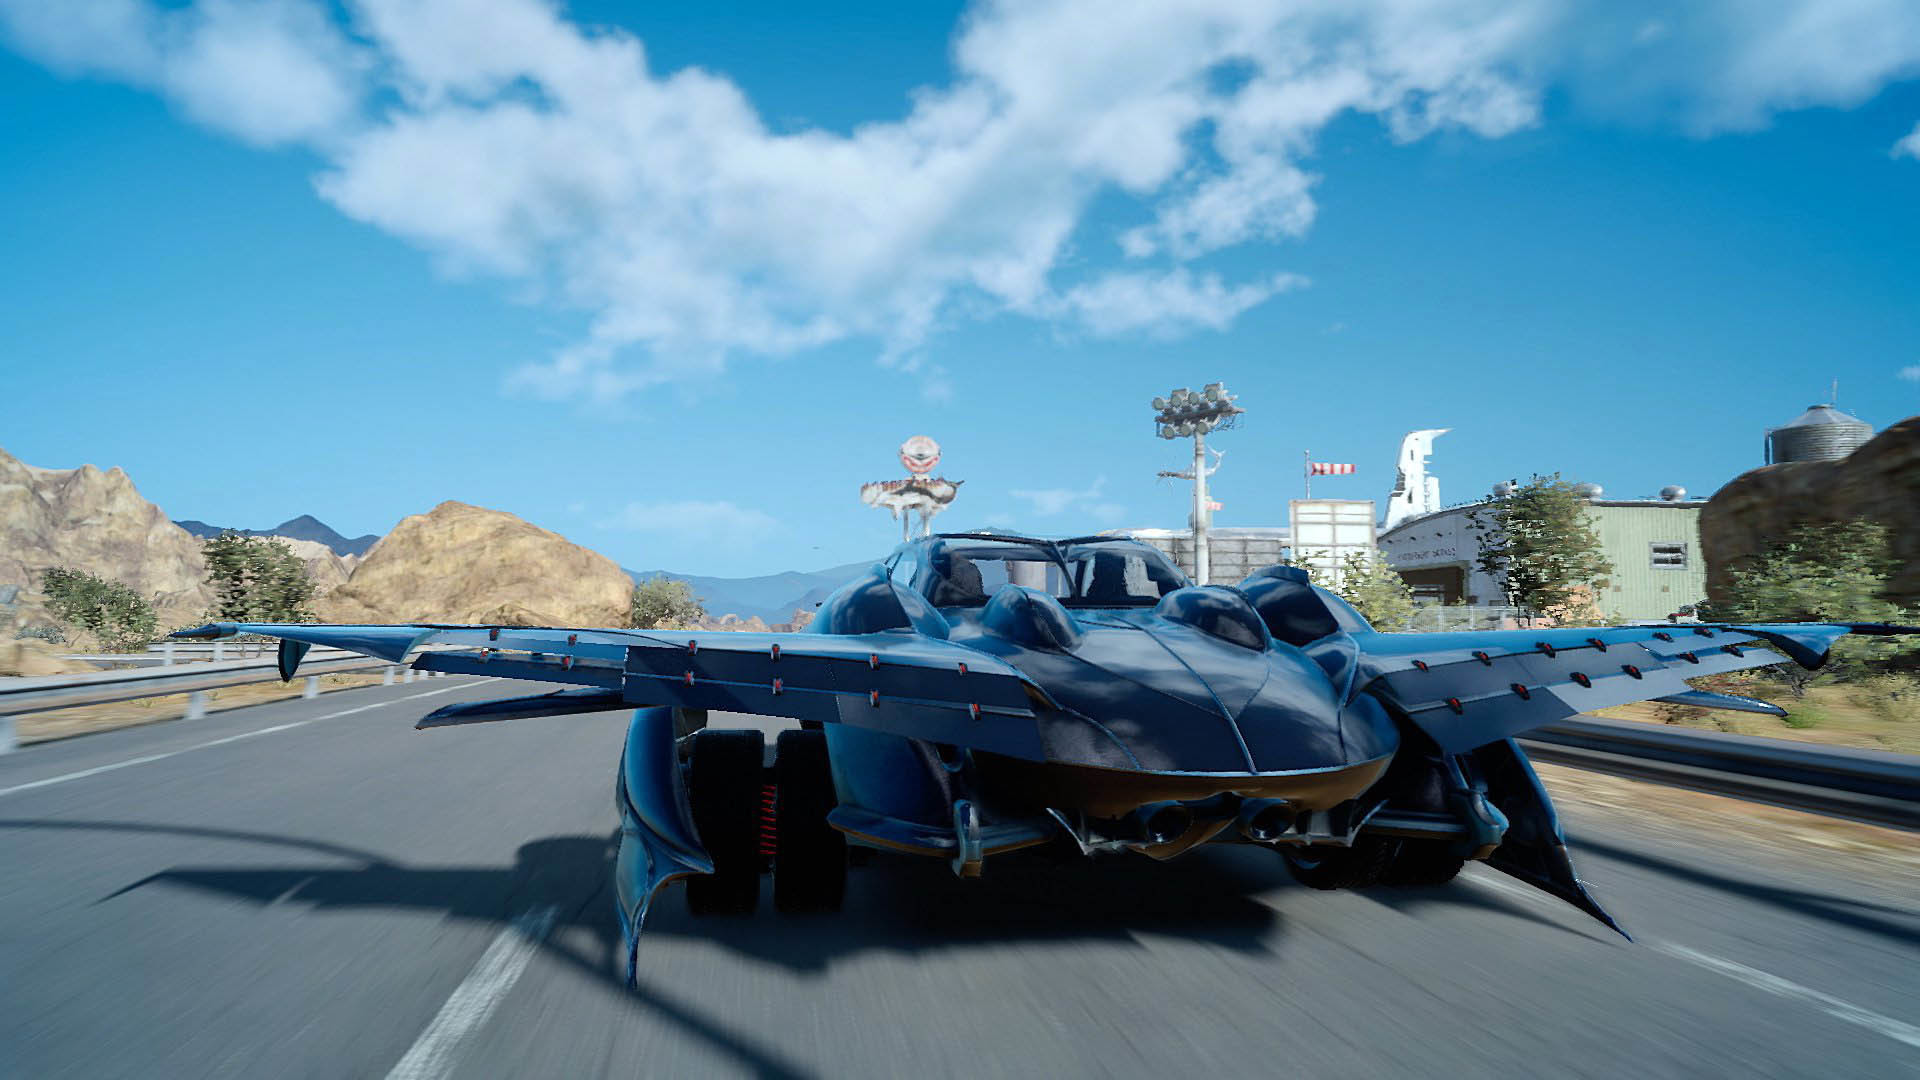 FFXV flying car (Regalia Type-F) takeoff – Final Fantasy XV  wallpaper